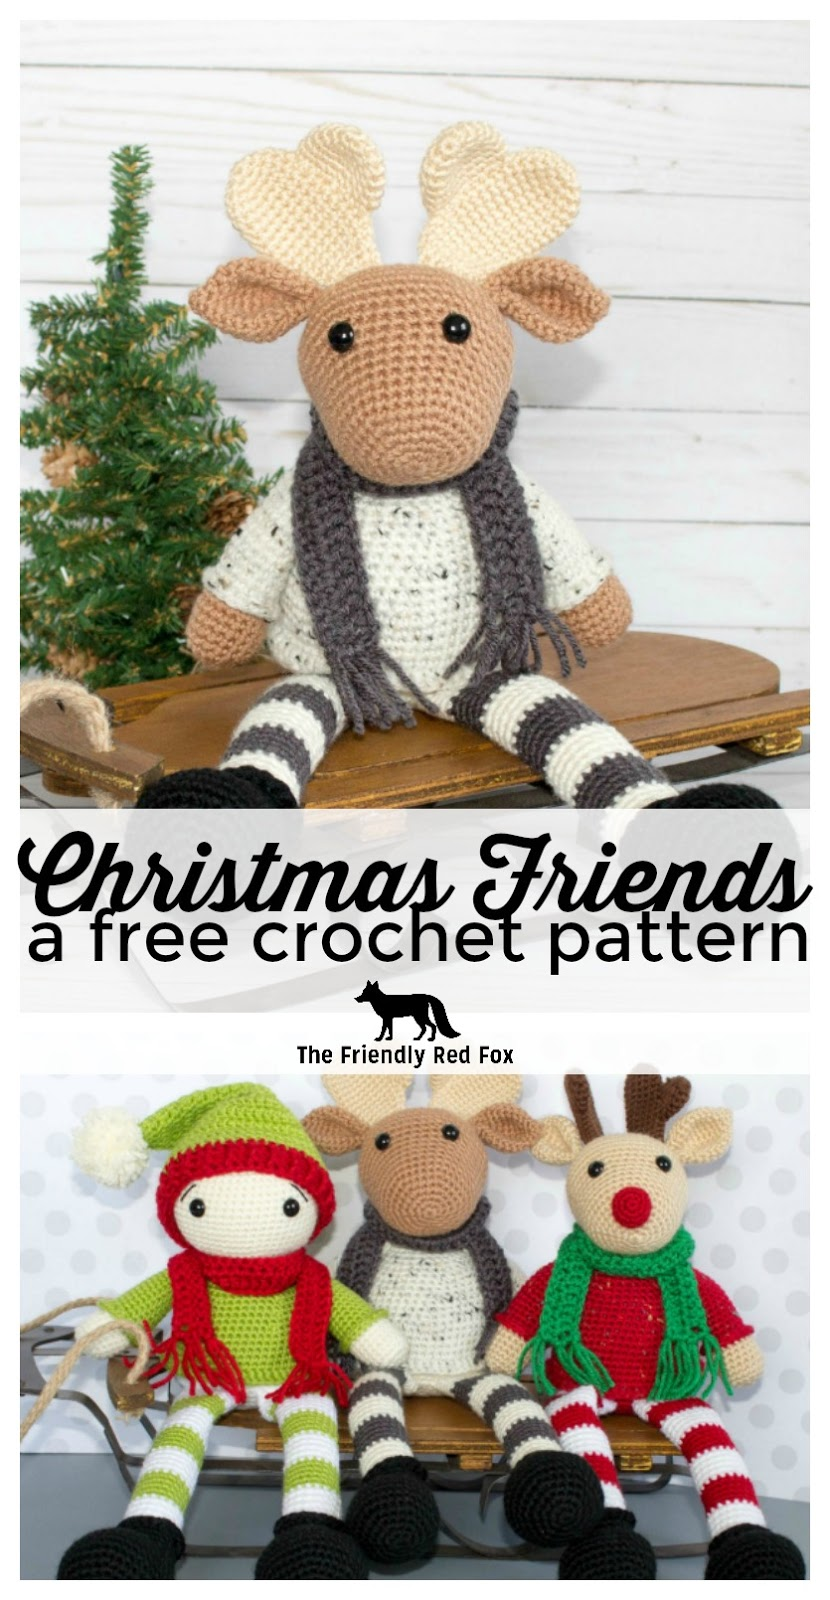 Free Patterns | Christmas crochet patterns, Christmas crochet ... | 1600x830